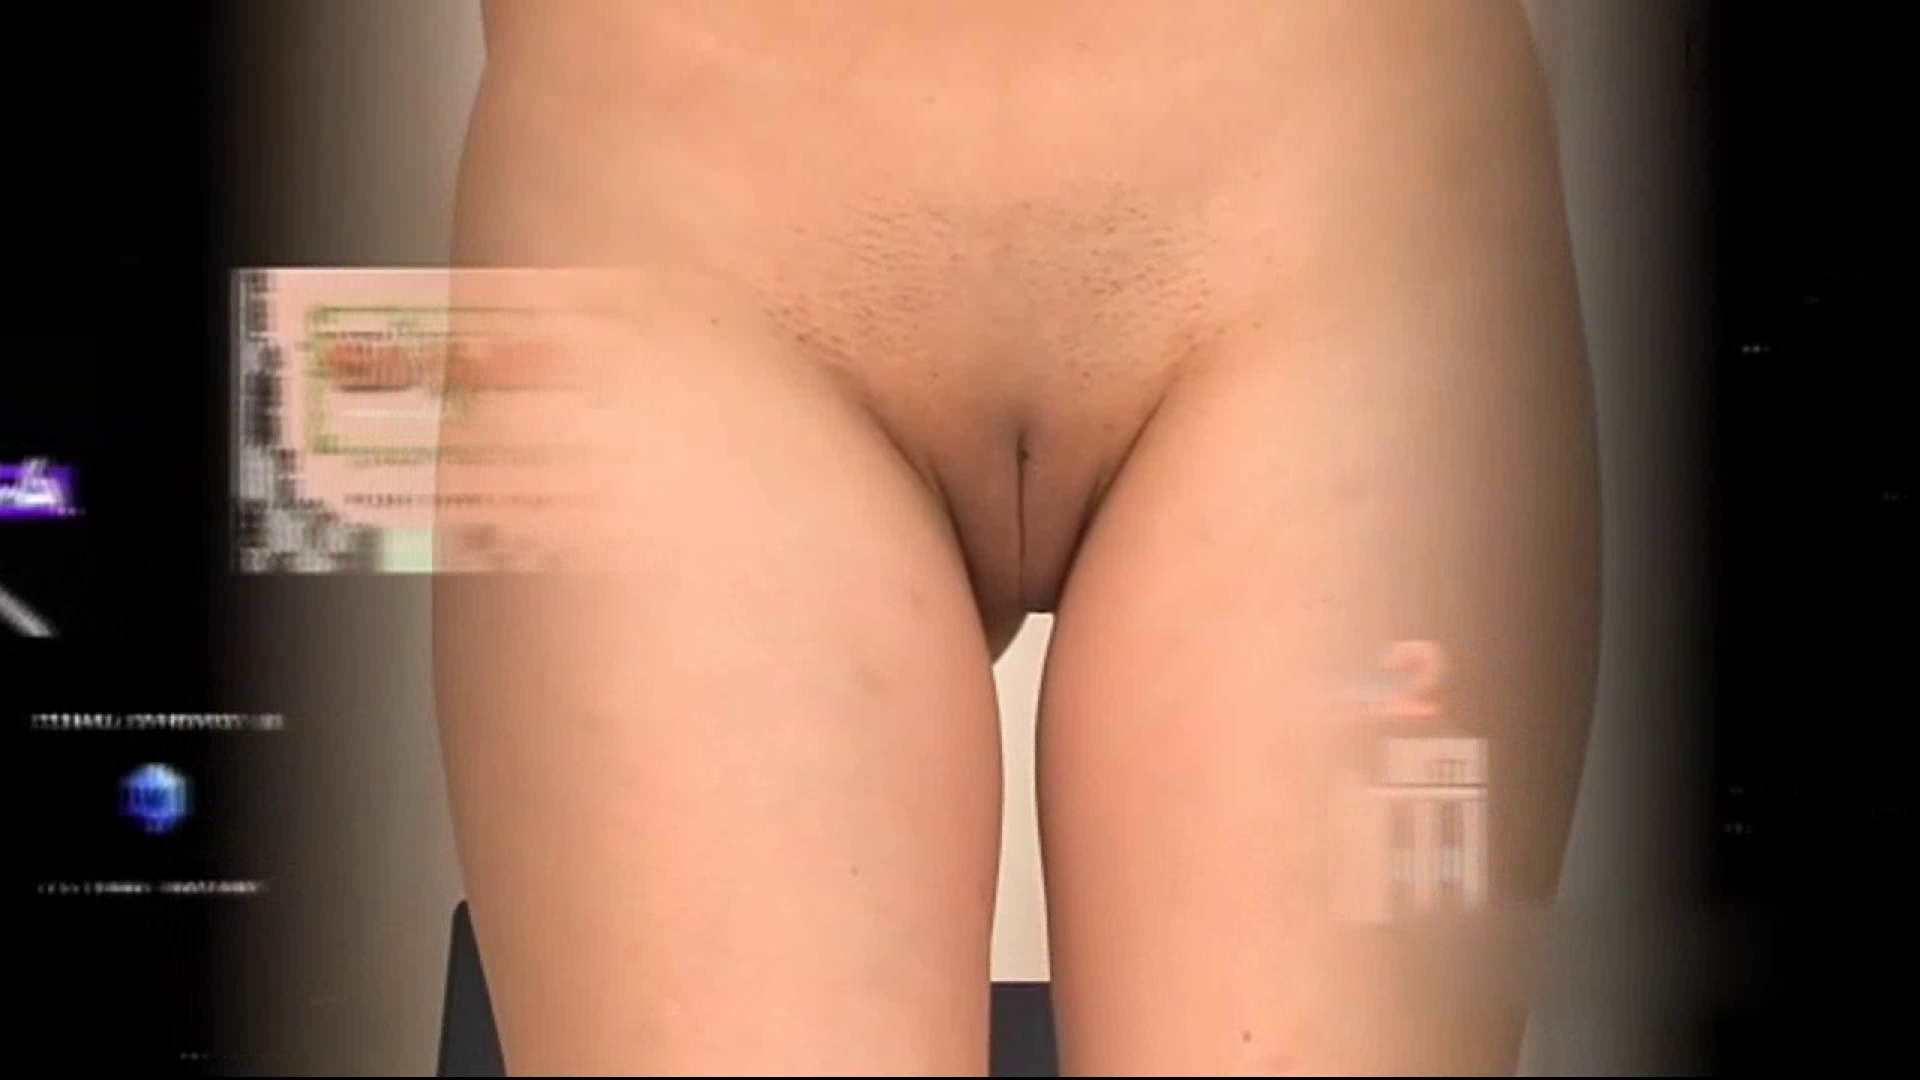 Hで可愛くてケシカラン! Vol.17 OLヌード天国 オマンコ動画キャプチャ 91PIX 89